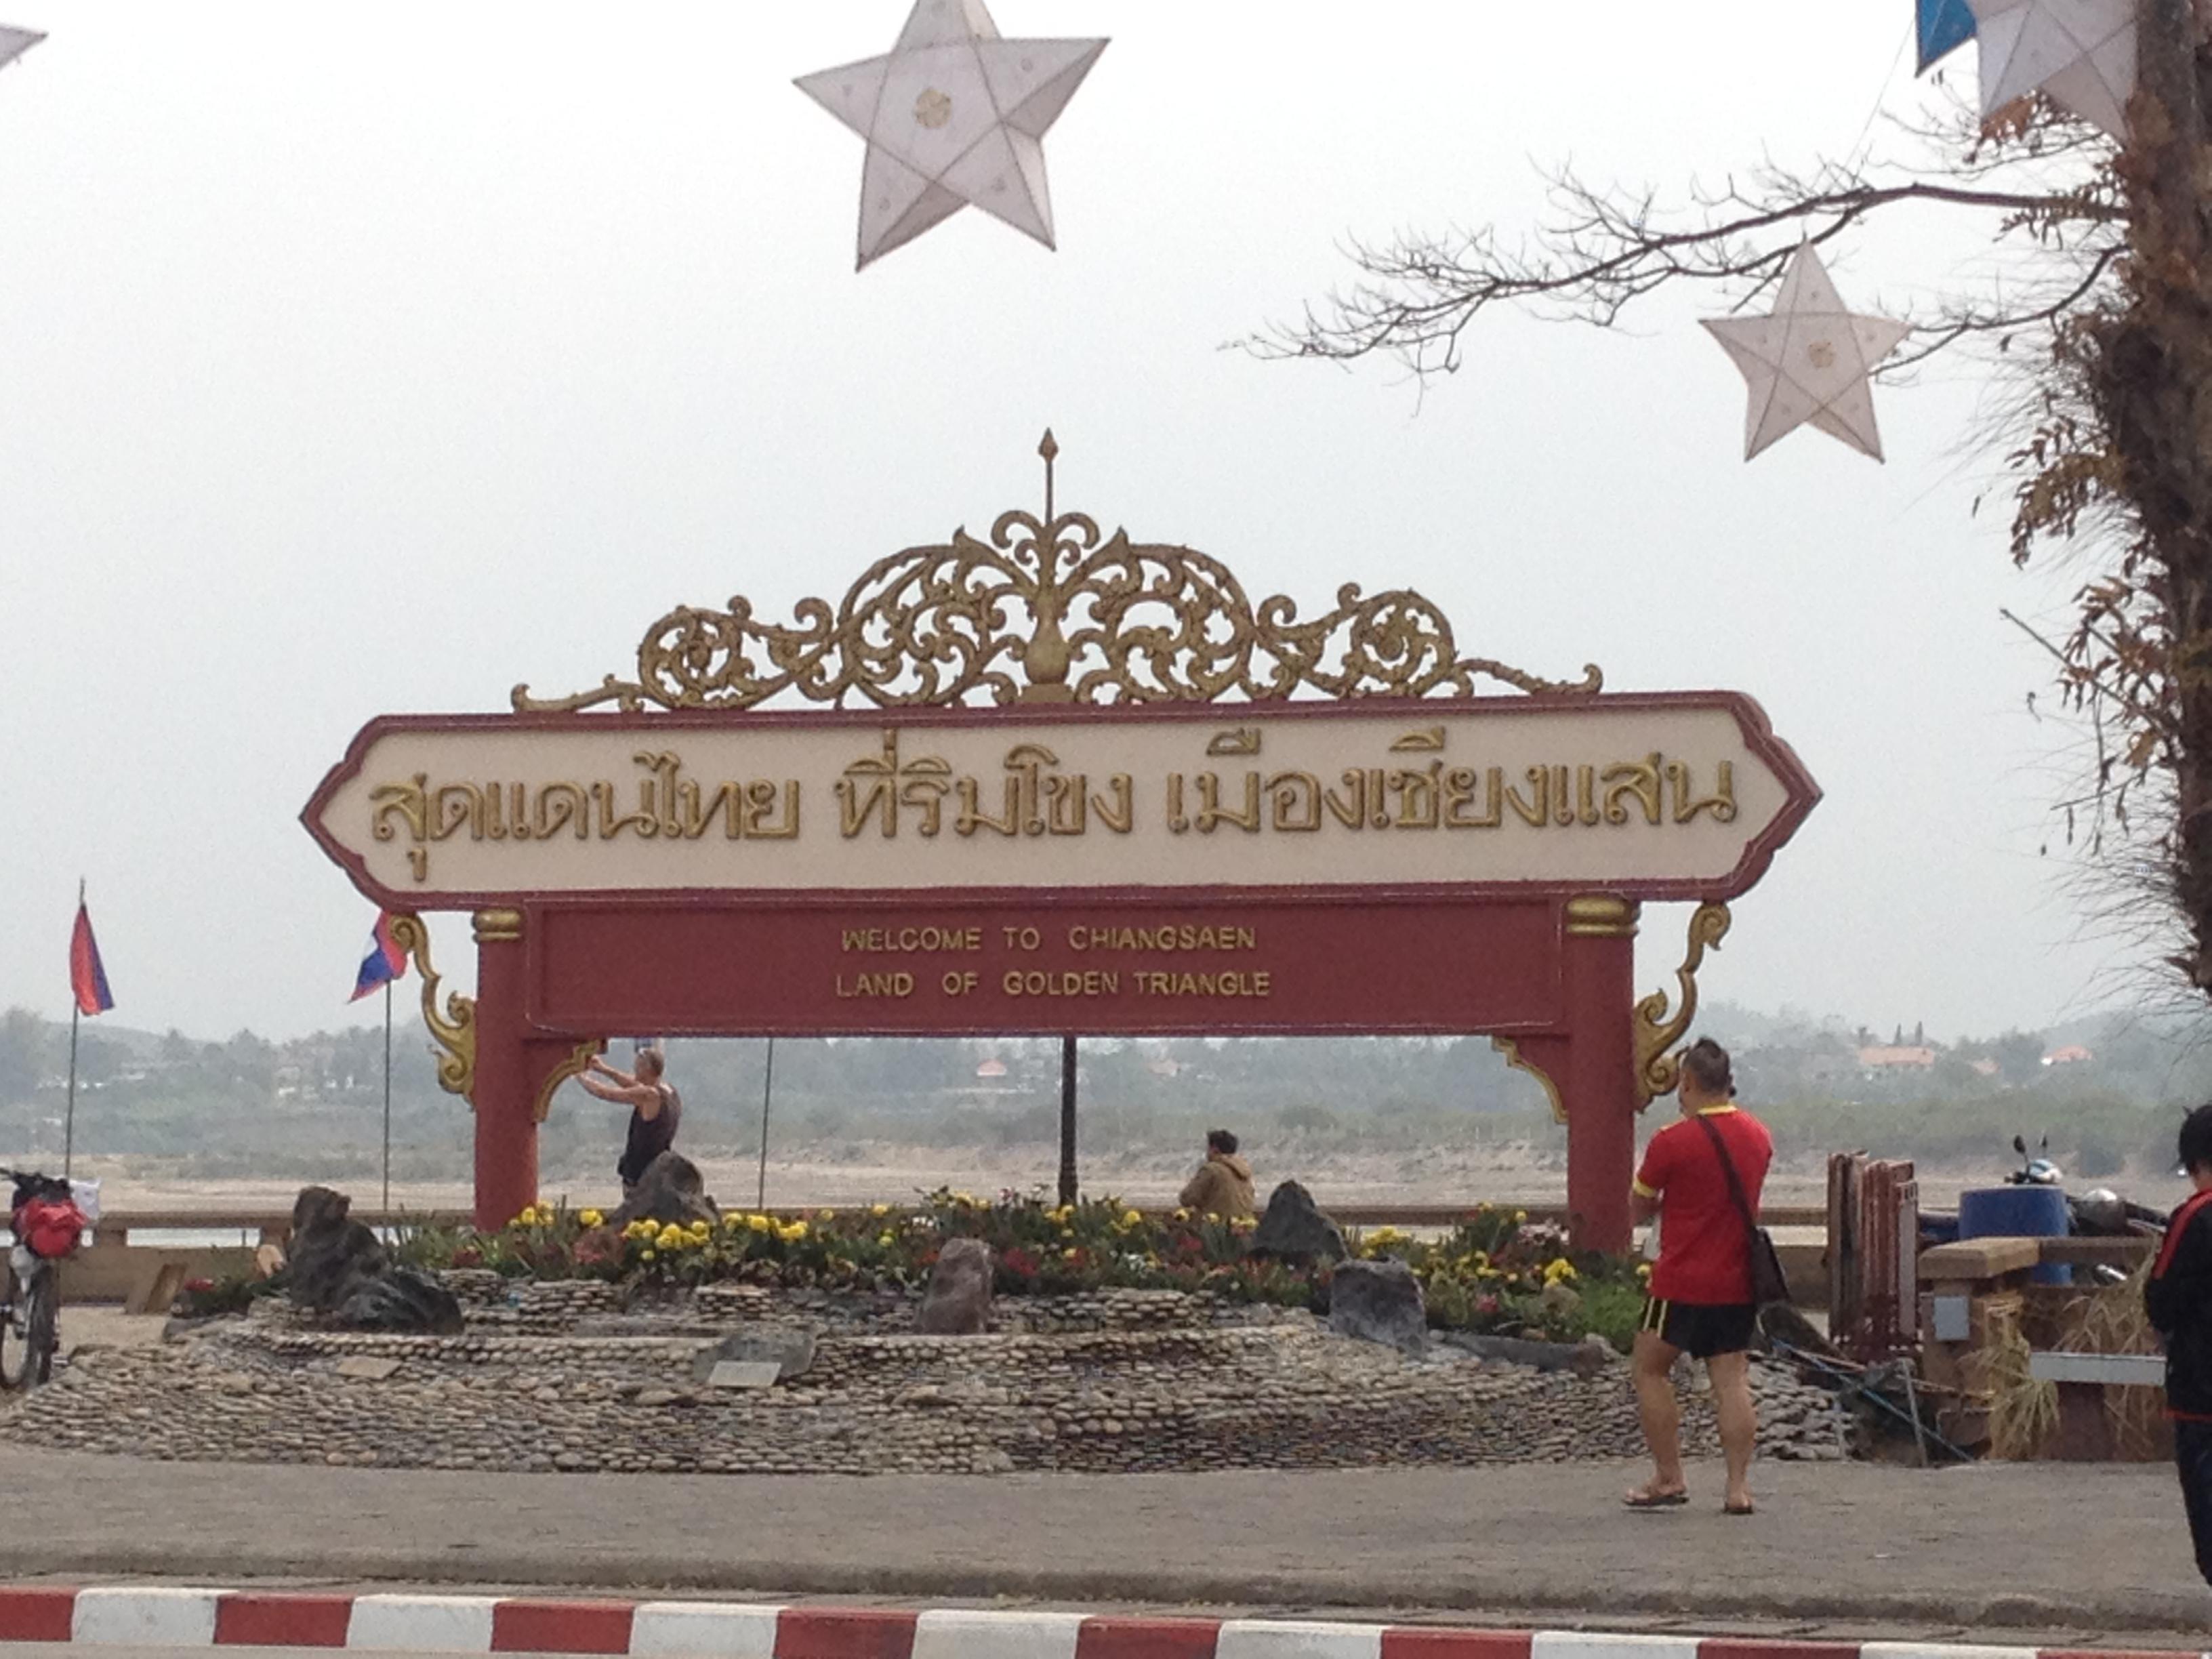 Défi de la semaine, rejoindre le Laos depuis la Birmanie via la Thaïlande